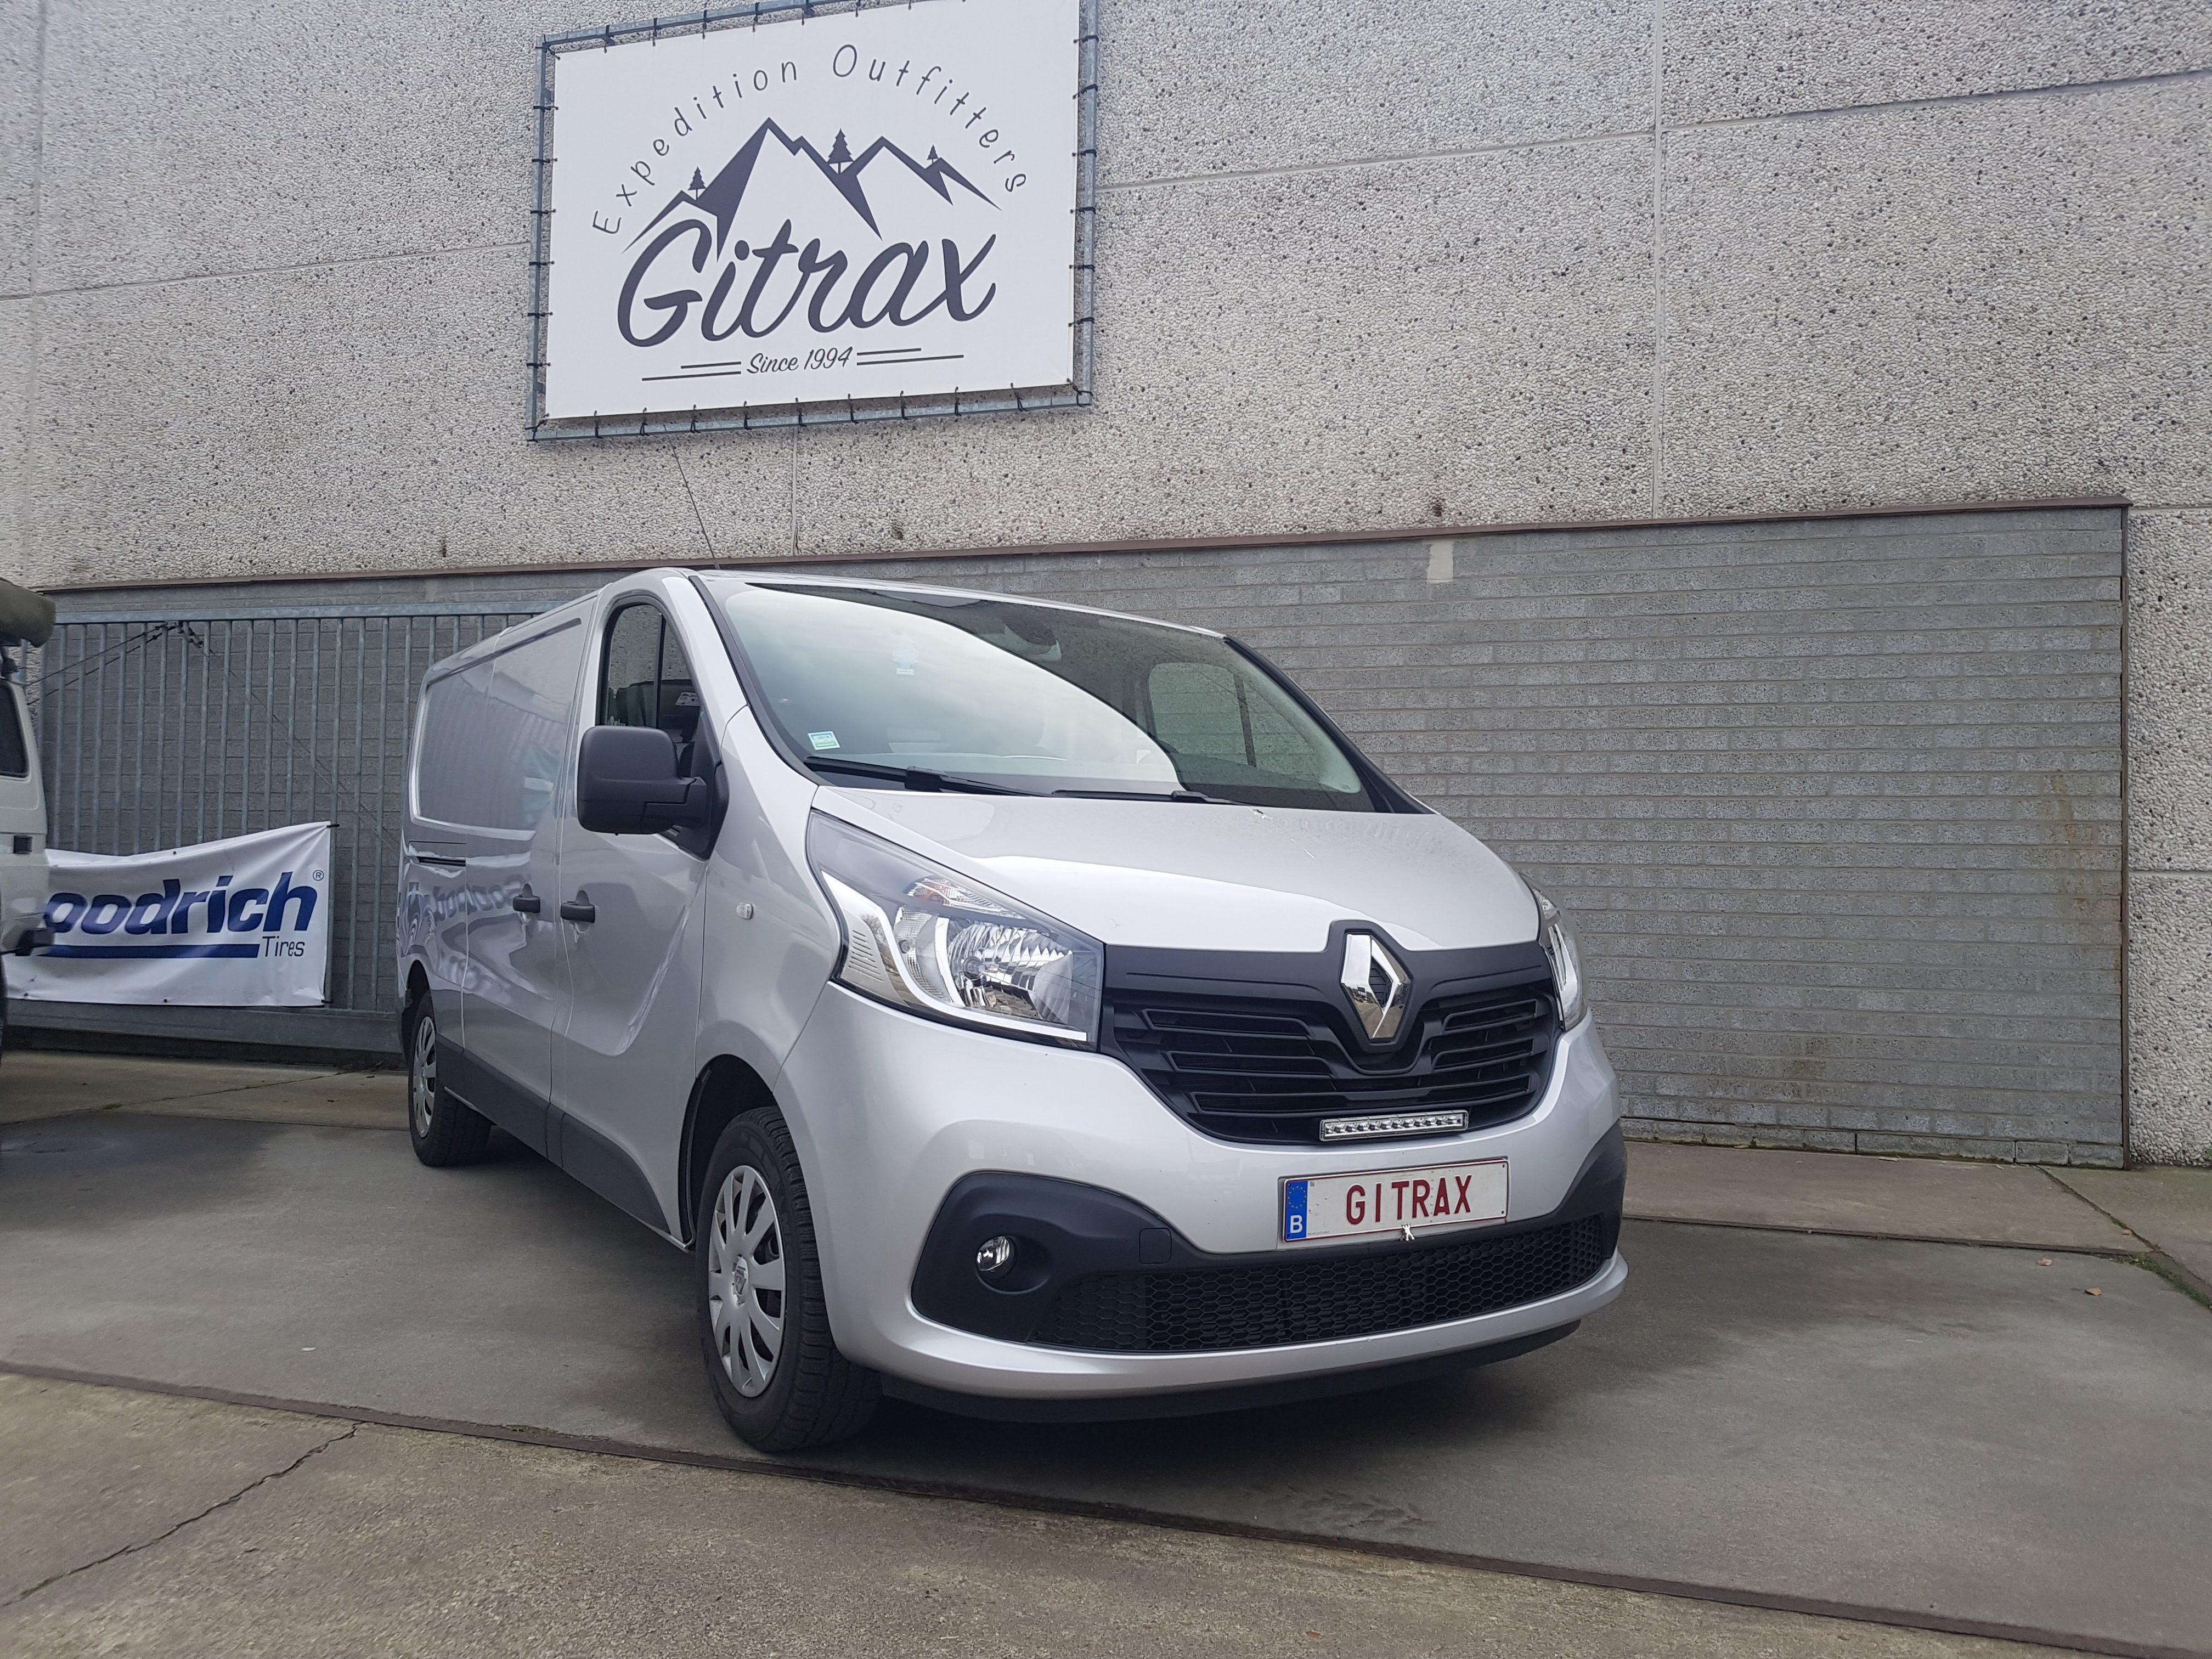 Renault Trafic Gitrax